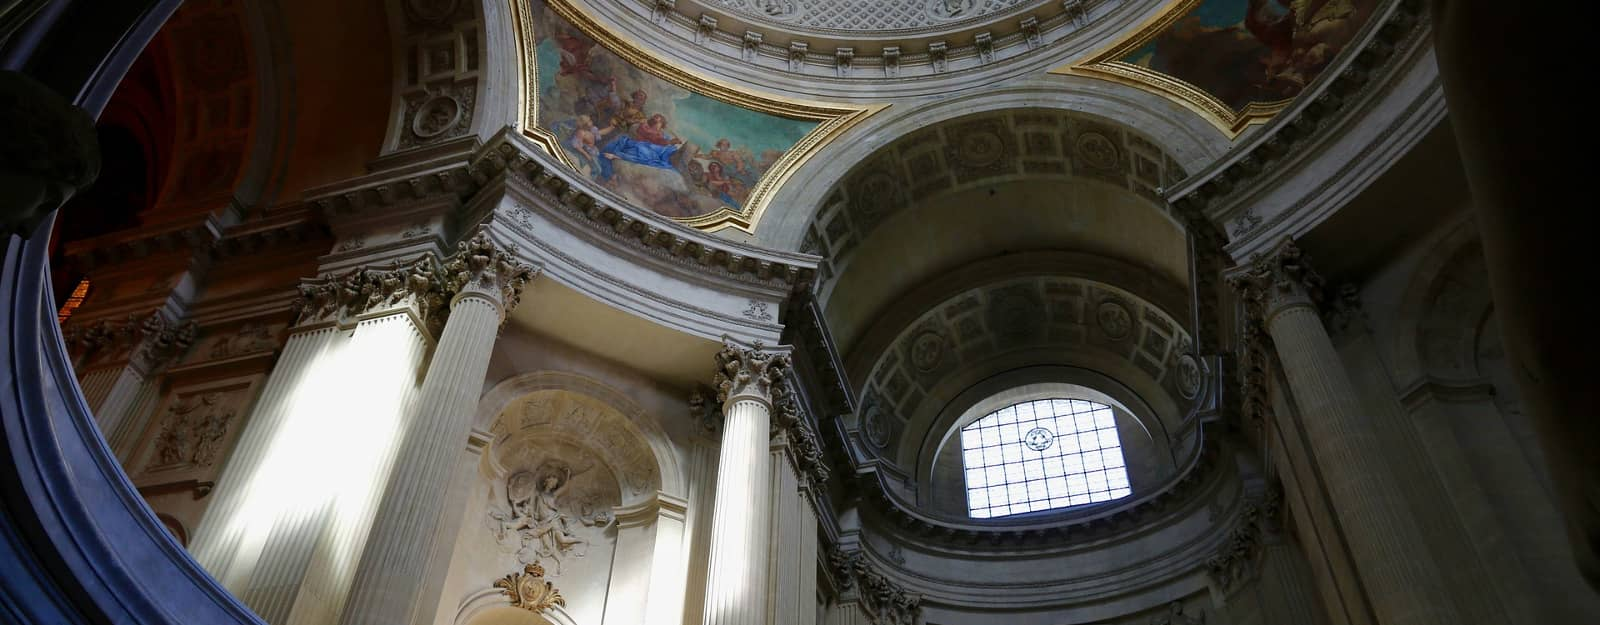 Pantheon Paris Beautiful Inside Image